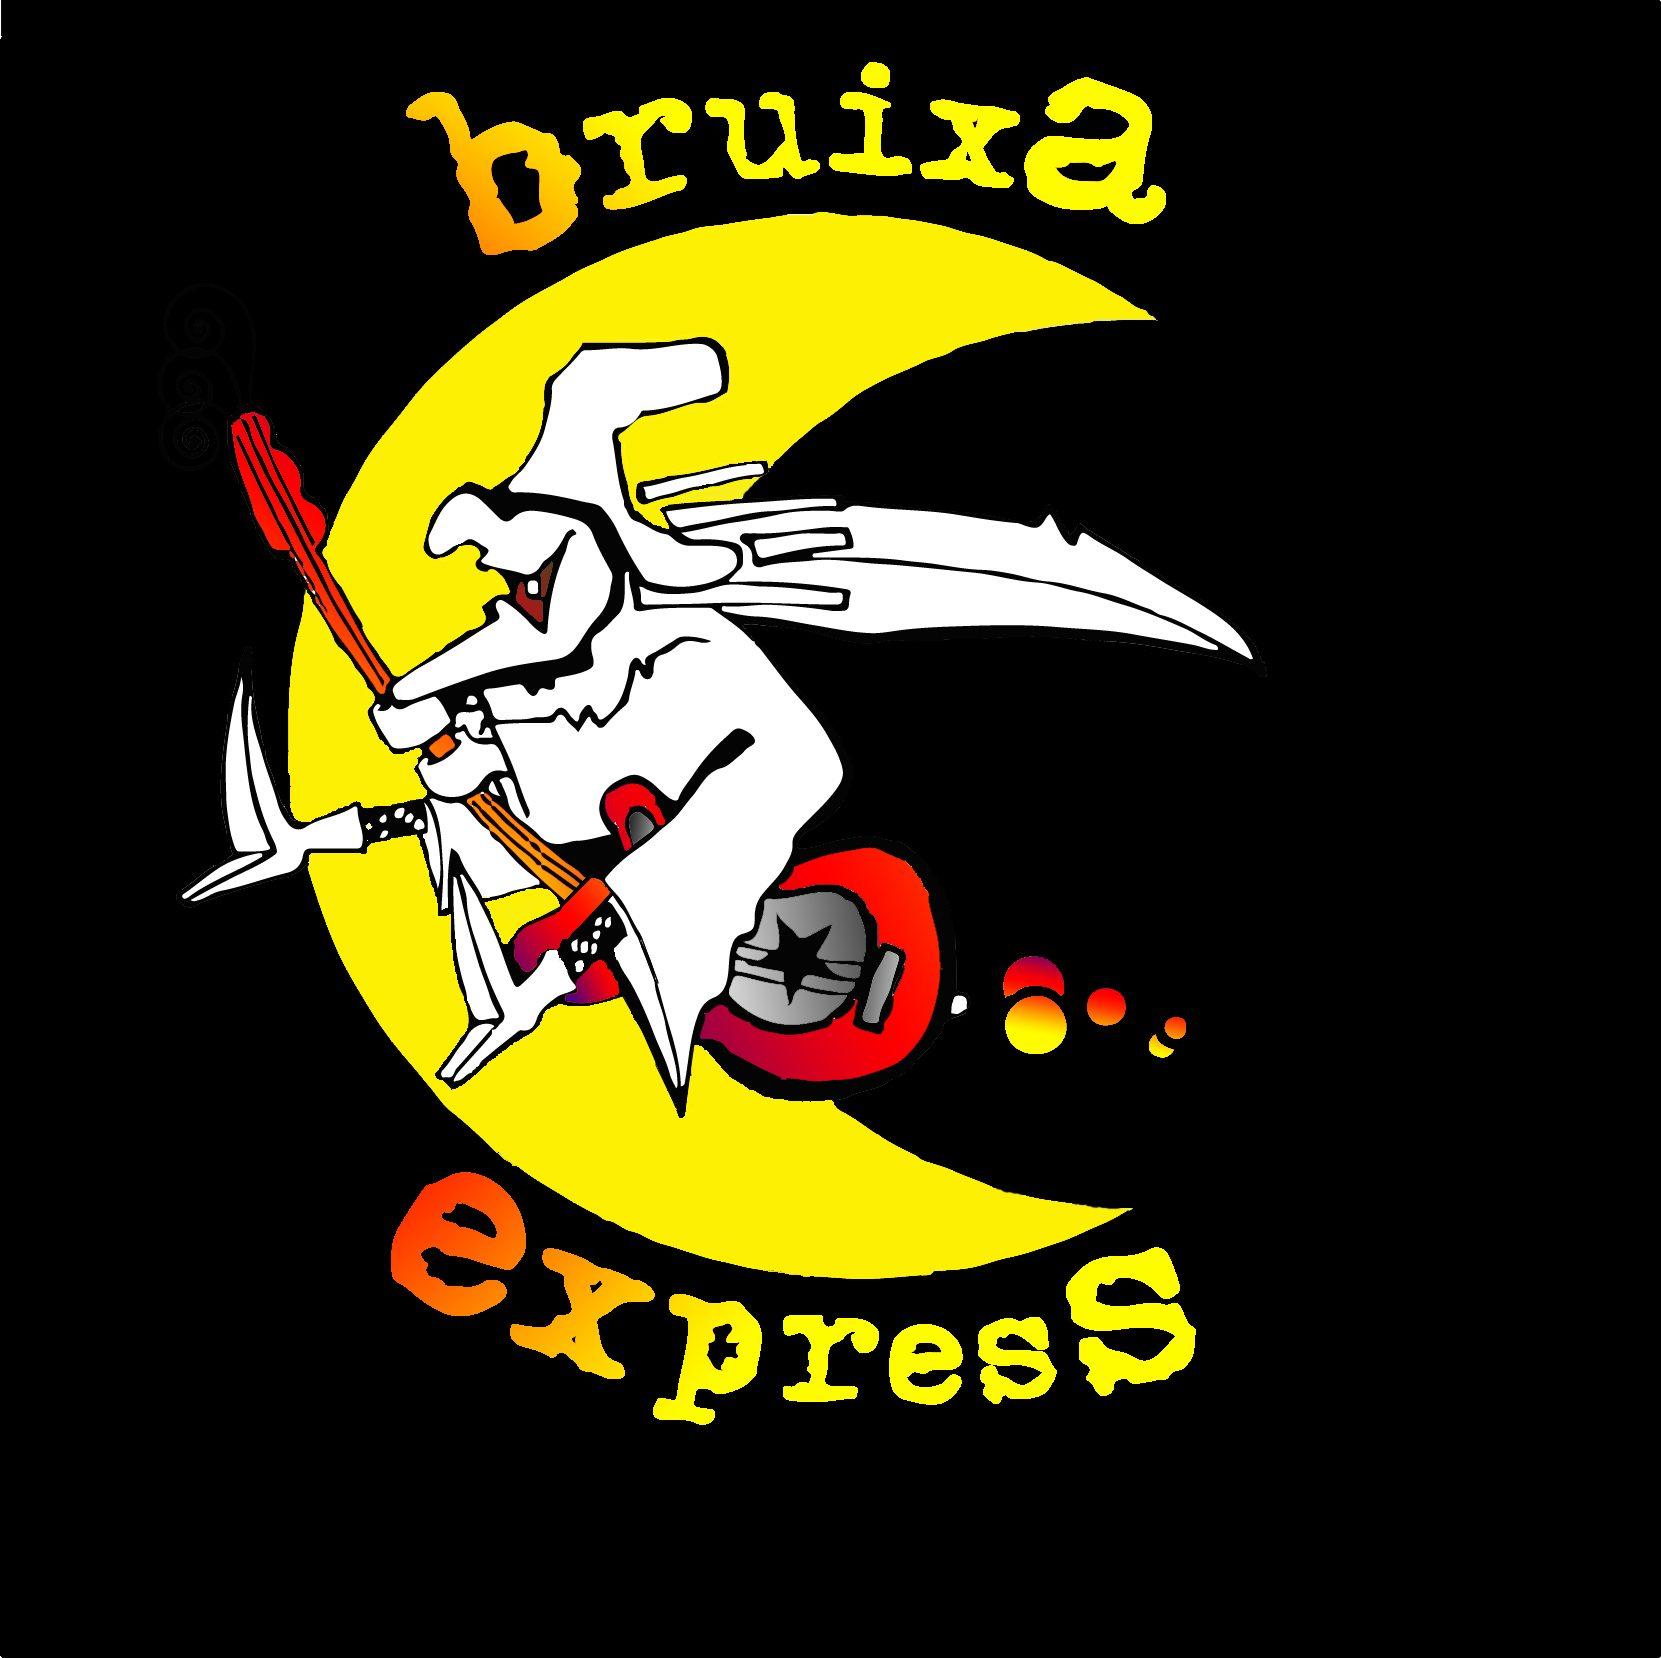 Bruixa Express